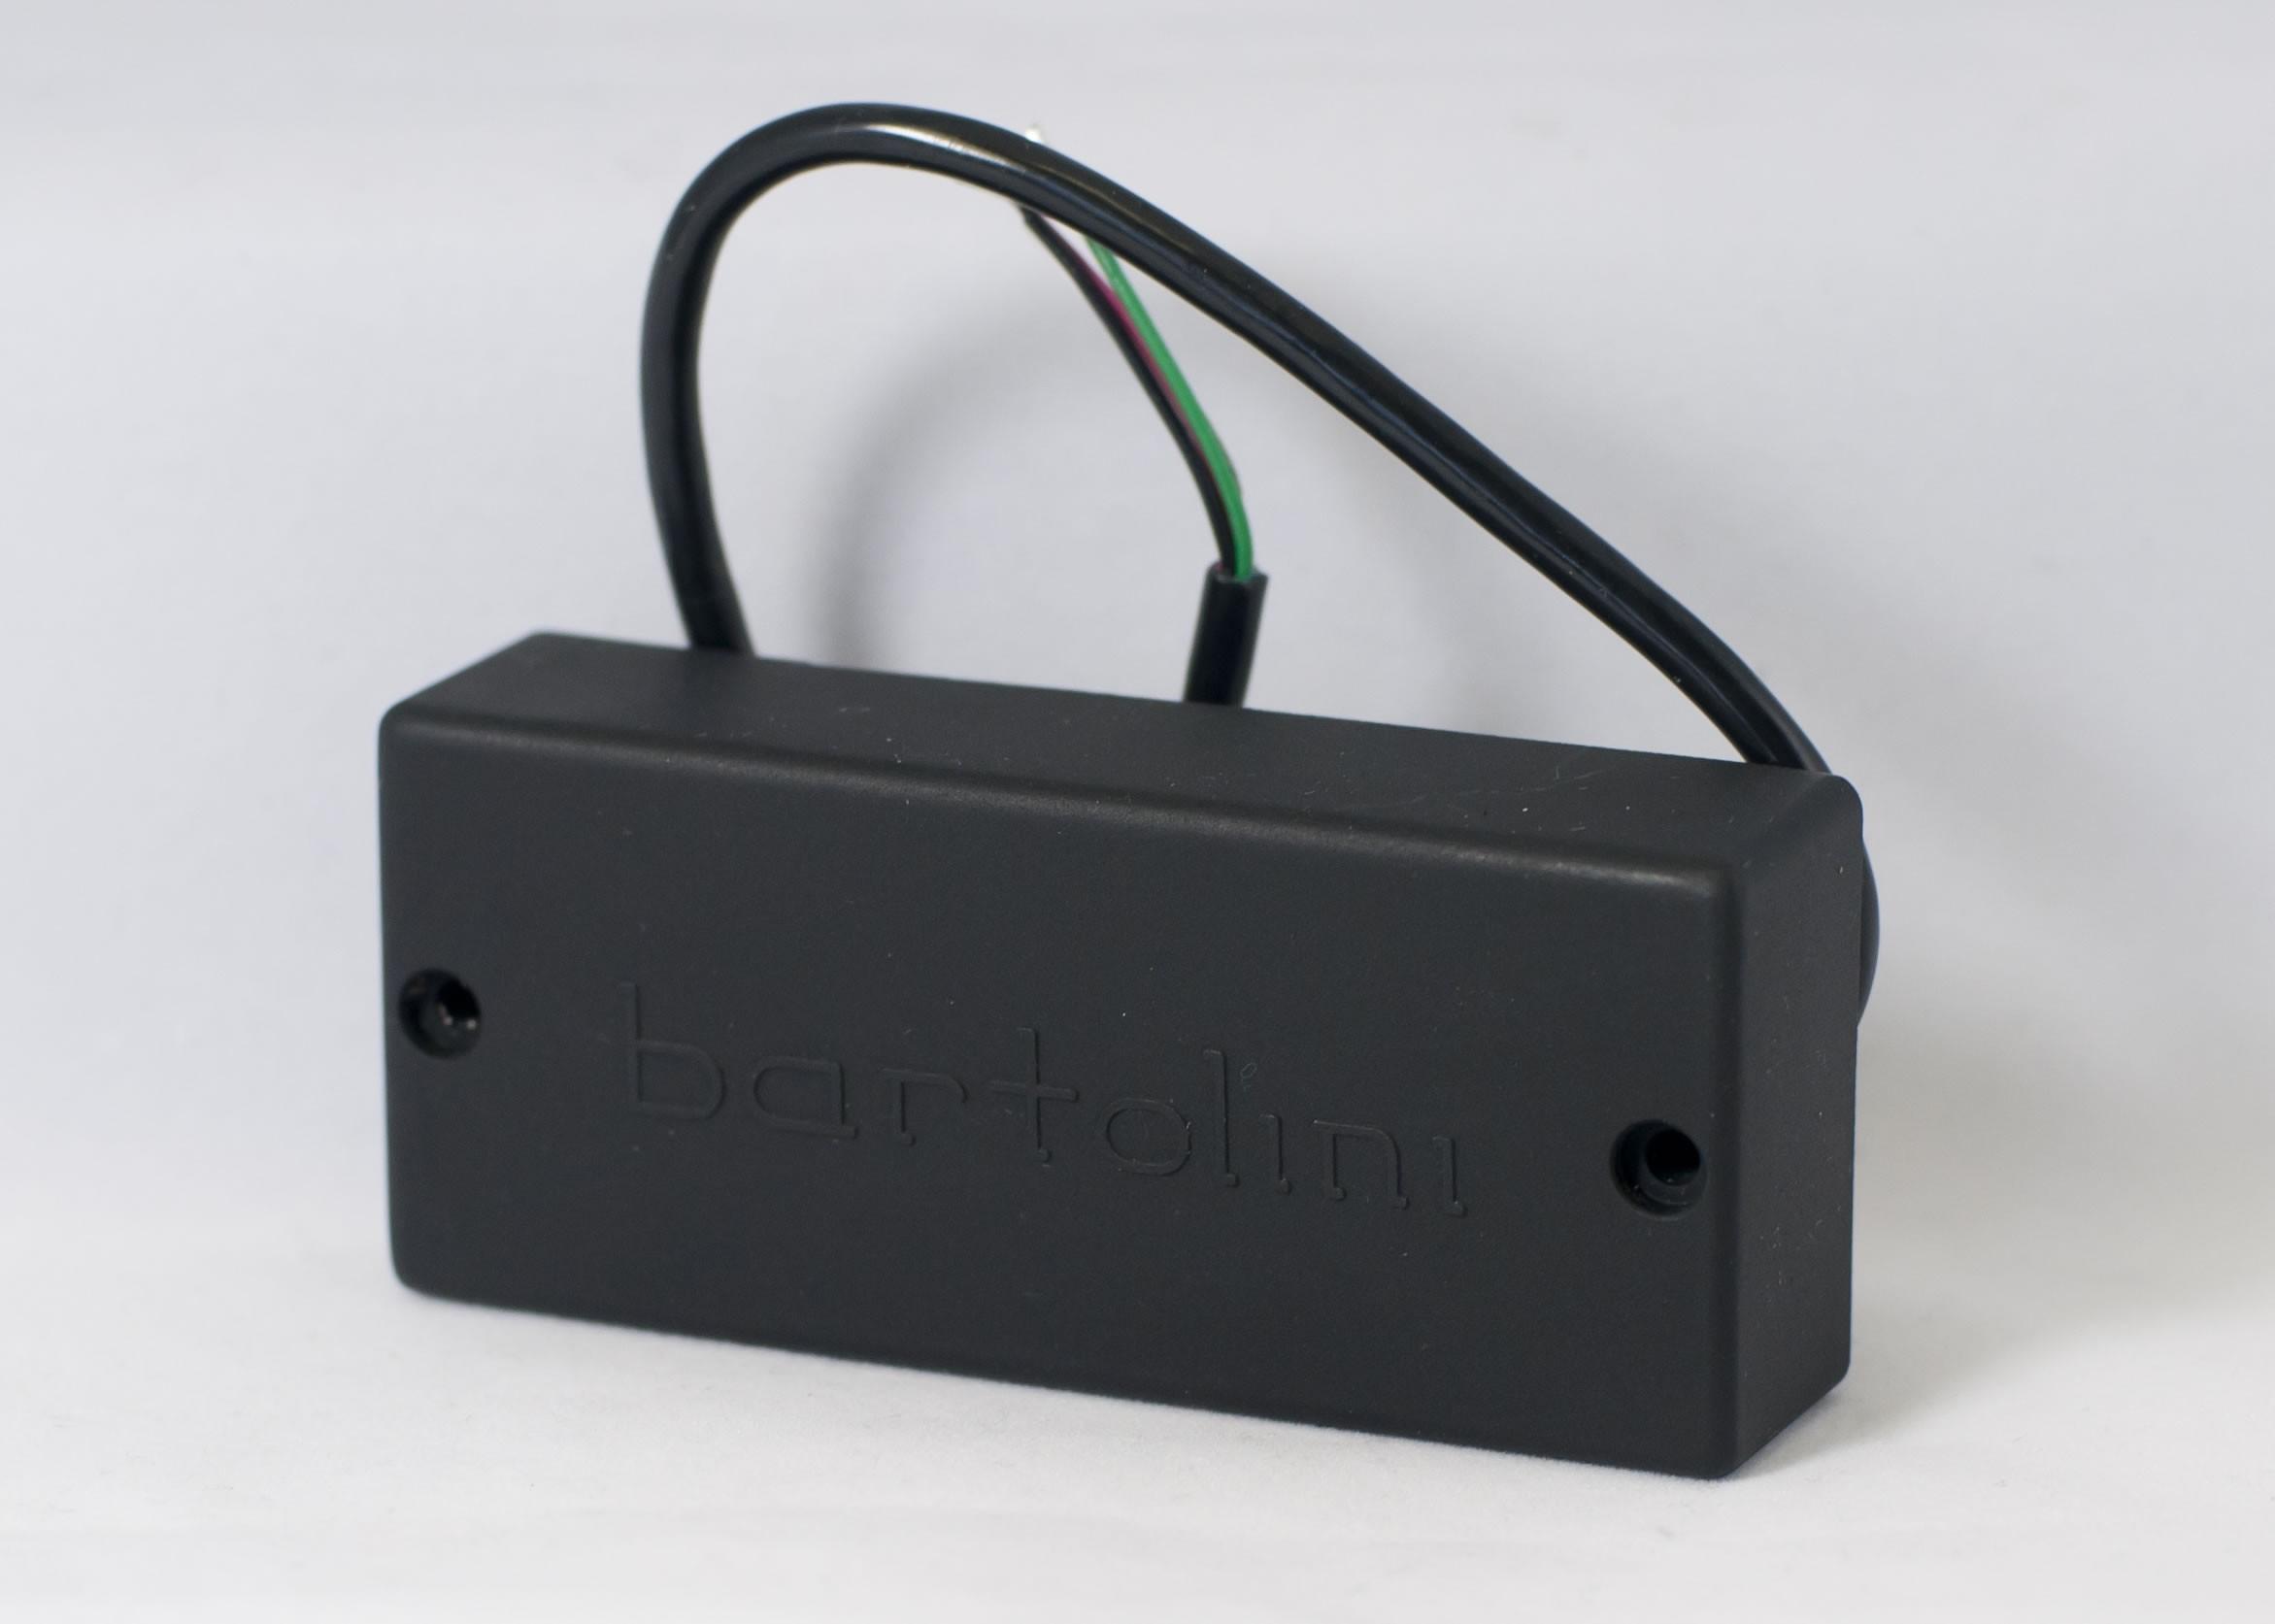 Bartolini M34C-T, 4 String Dual Coil Bridge Humbucker Pickup - Best on emg wiring diagrams 2 volume 3-way, emg strat wiring diagrams, emg wiring diagram 5 way to, emg wiring harness diagram, emg solderless 3-way switch, emg wiring guide, emg wiring kit, emg active bass pickup diagram, emg sa single coil pickups, emg p bass wiring diagram,